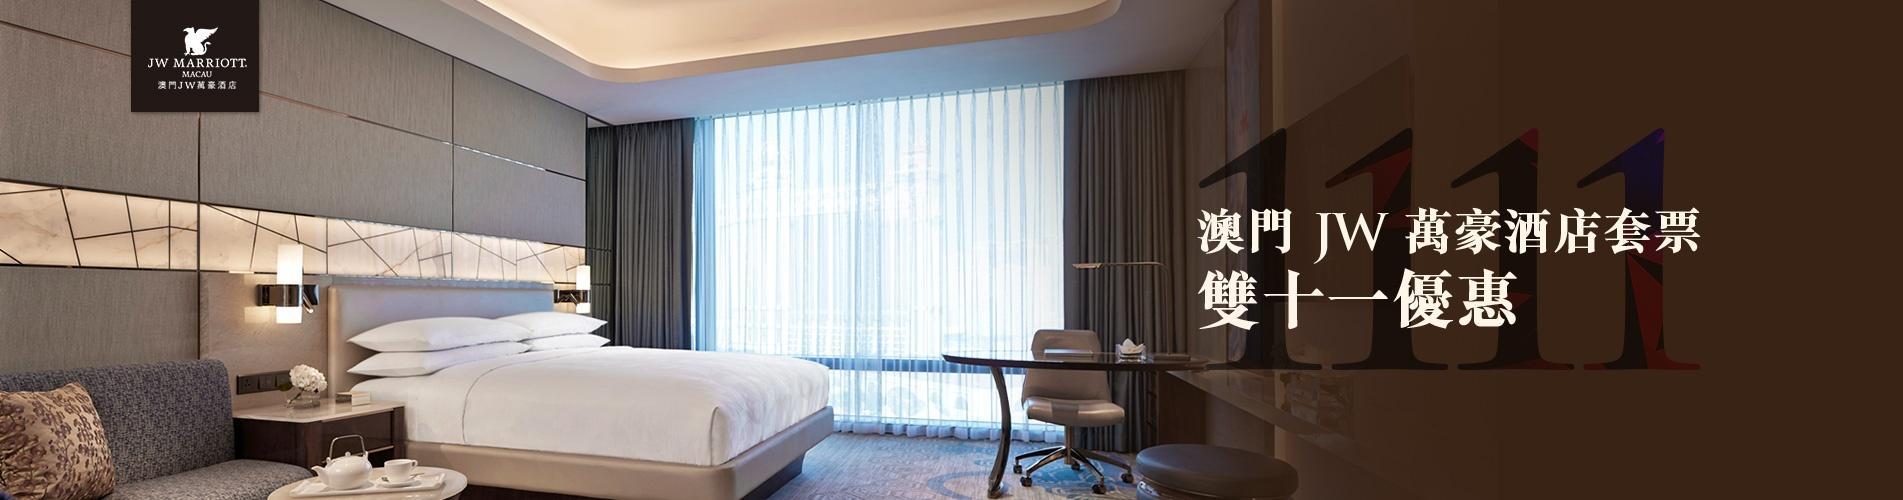 /images/stories/hotel/main-thumbnail-macau-jw-marriott.jpg